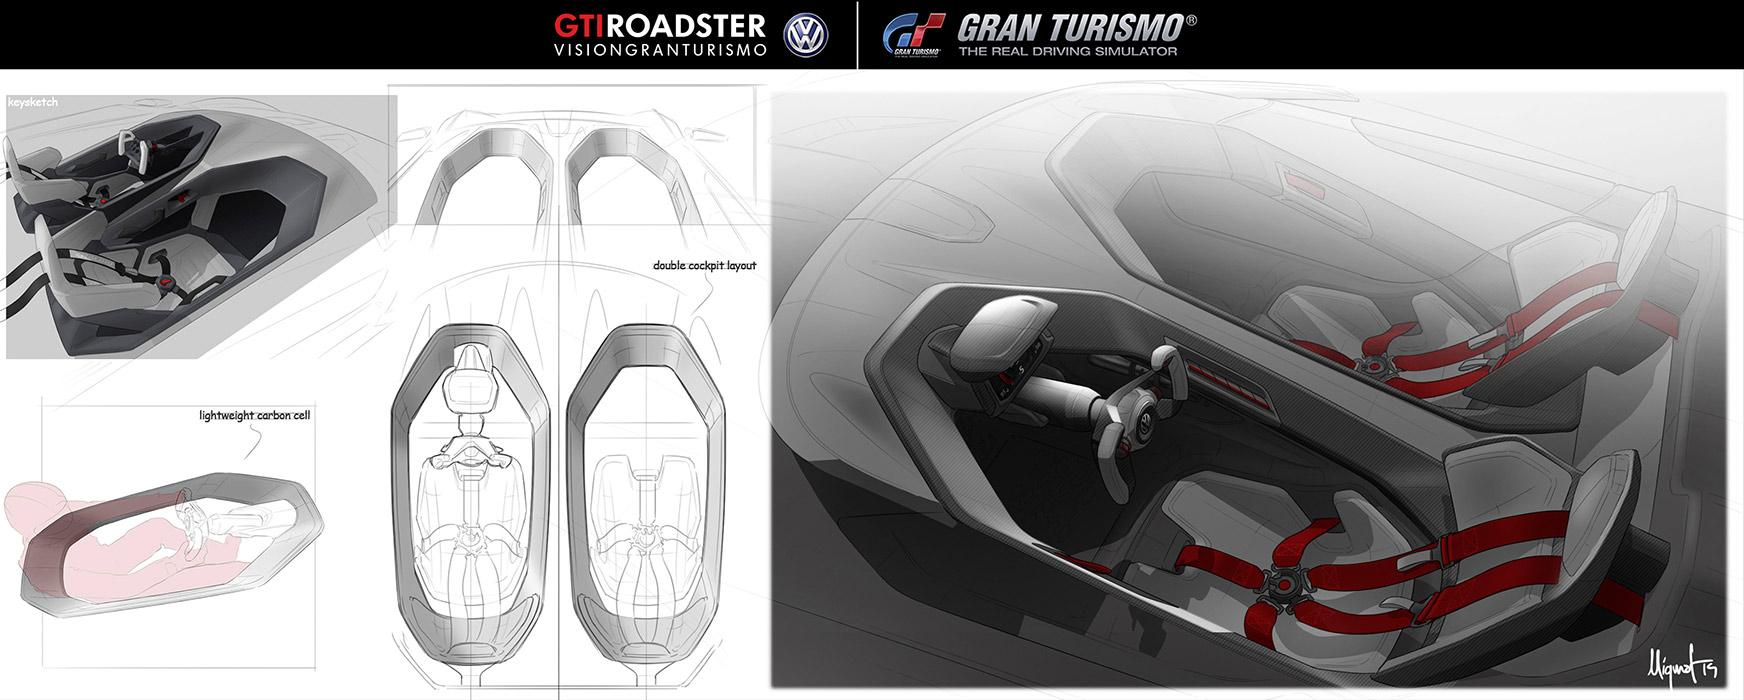 volkswagen-design-vision-gti-gran-turismo-011